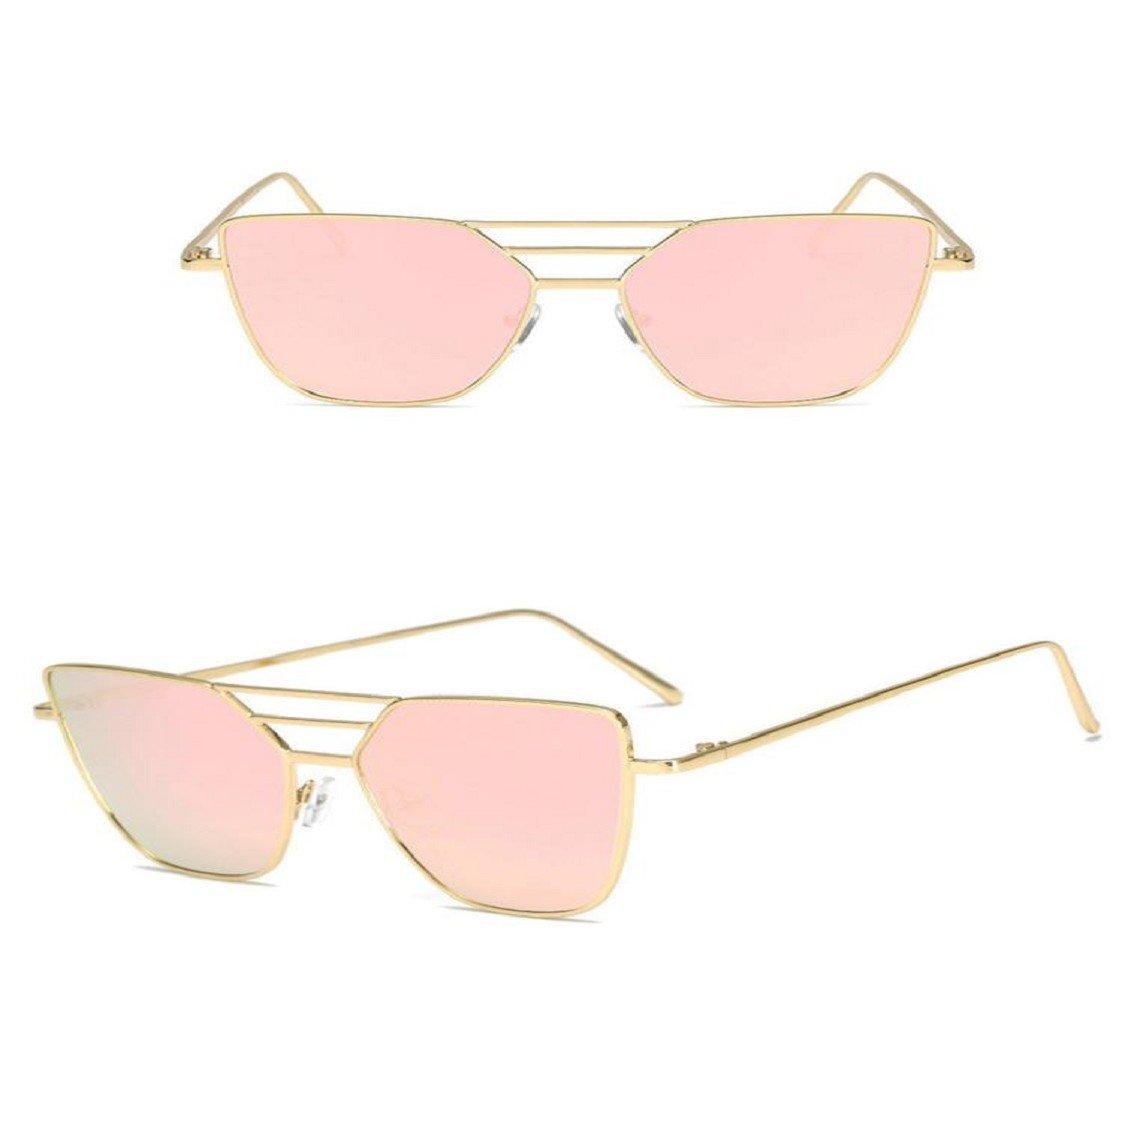 Naladoo Women Men Sunglasses,Fashion Unisex Vintage Irregular Glasses Fashion Aviator Mirror Sunglasses Pink